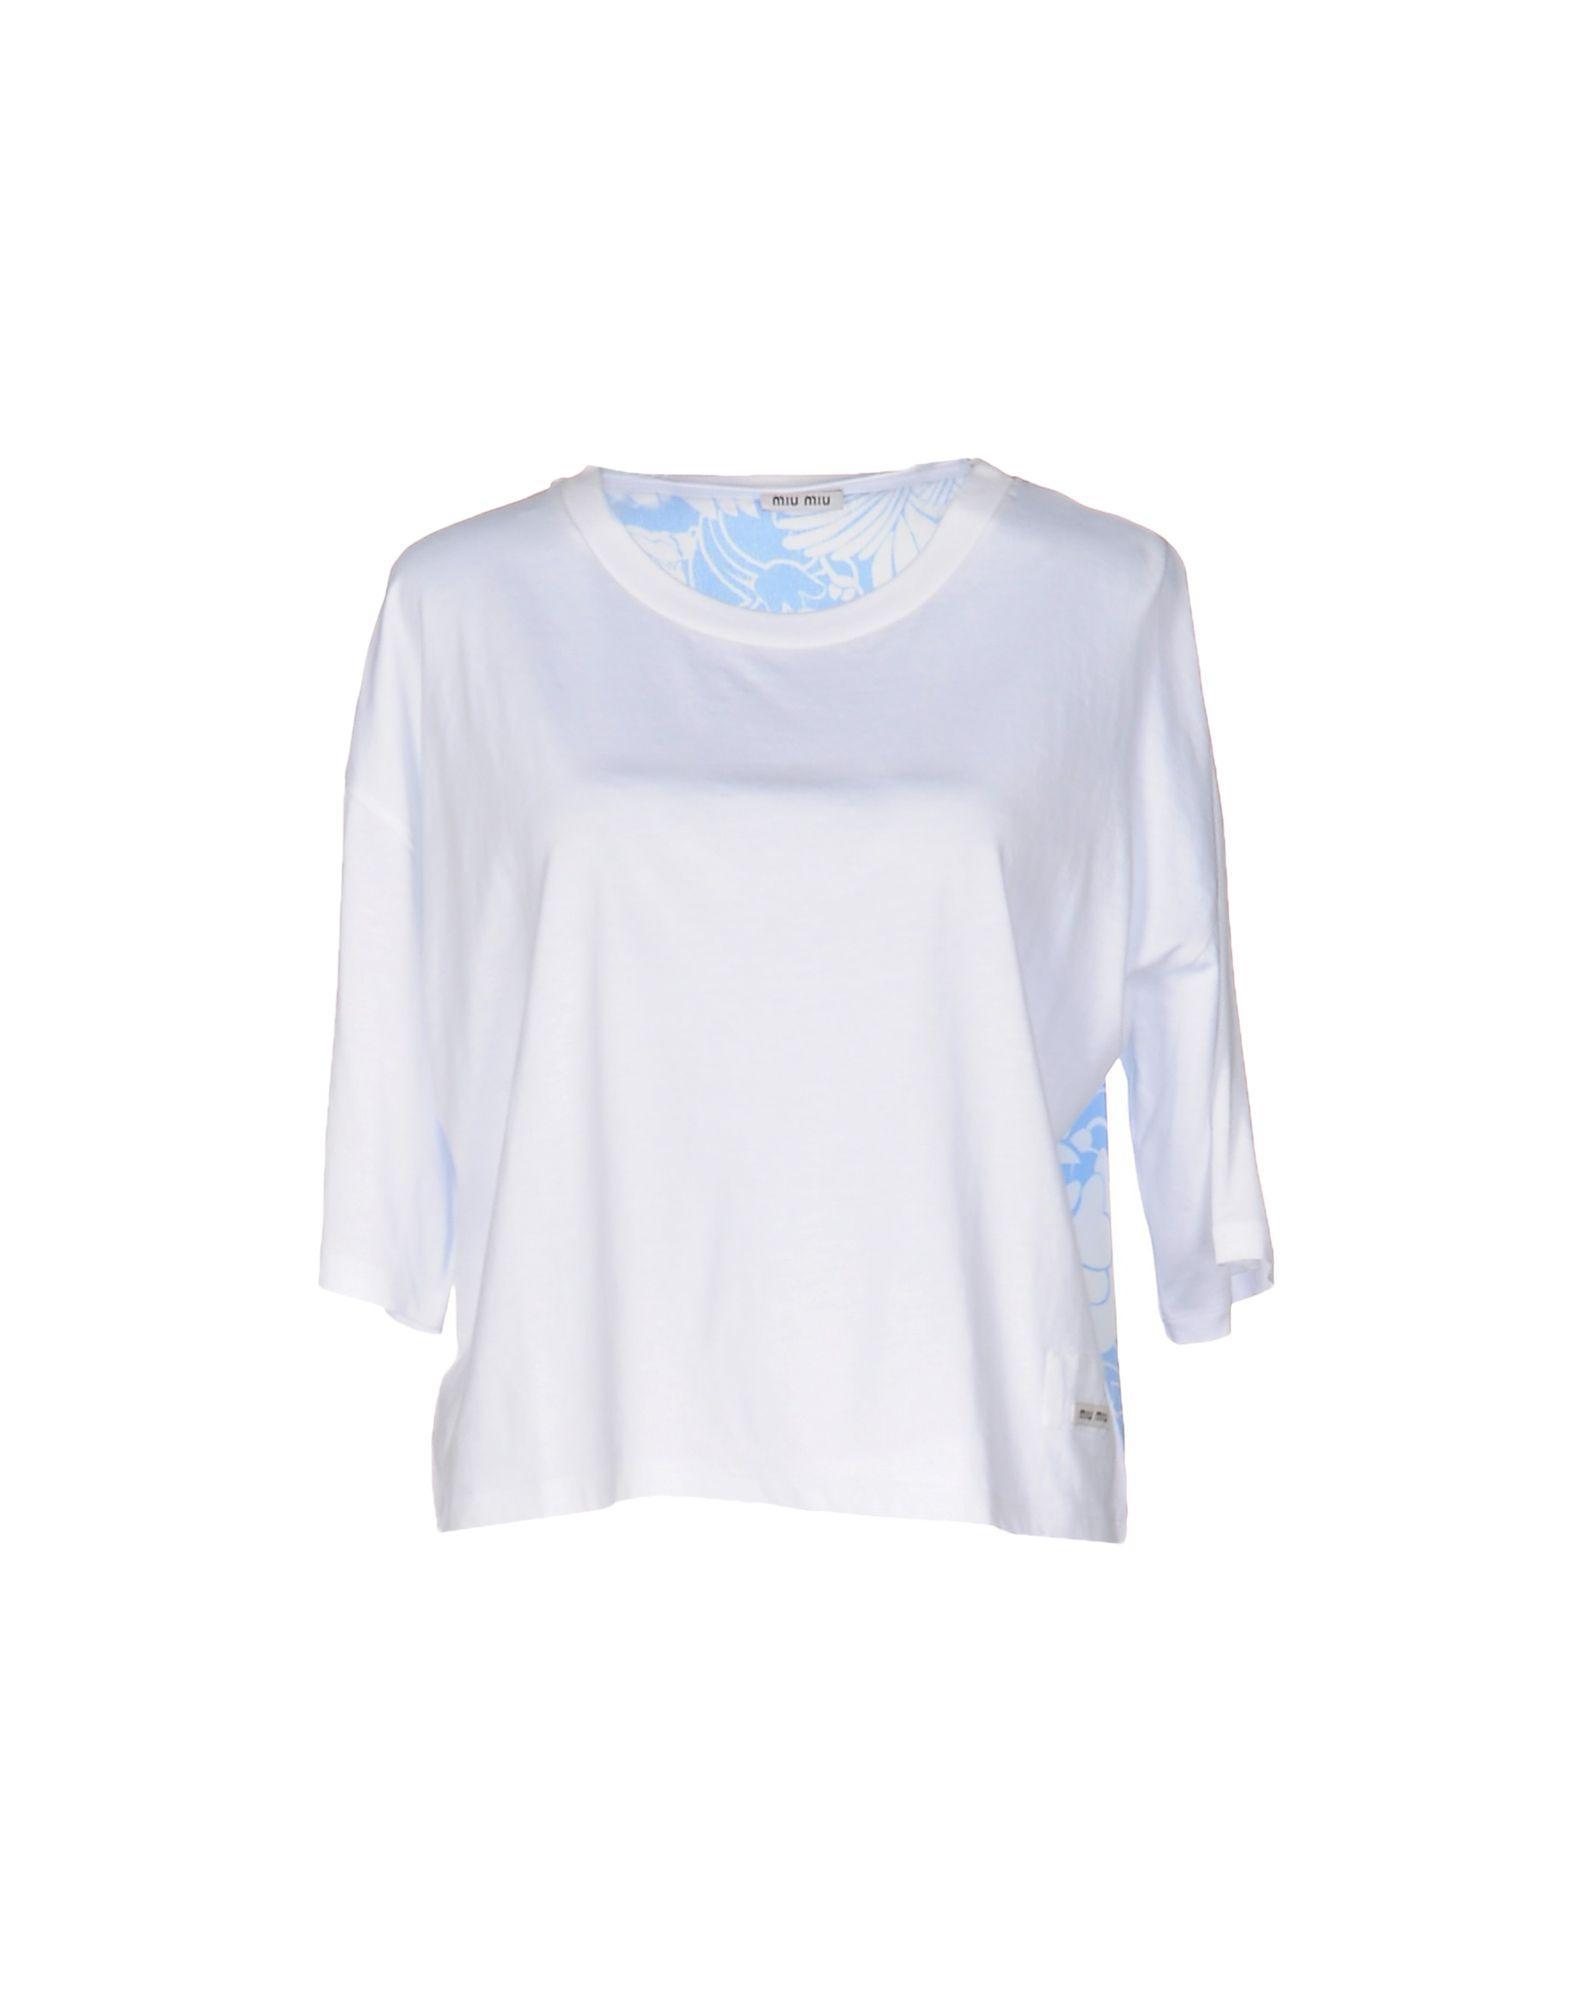 Miu miu t shirt in white lyst for Miu miu t shirt